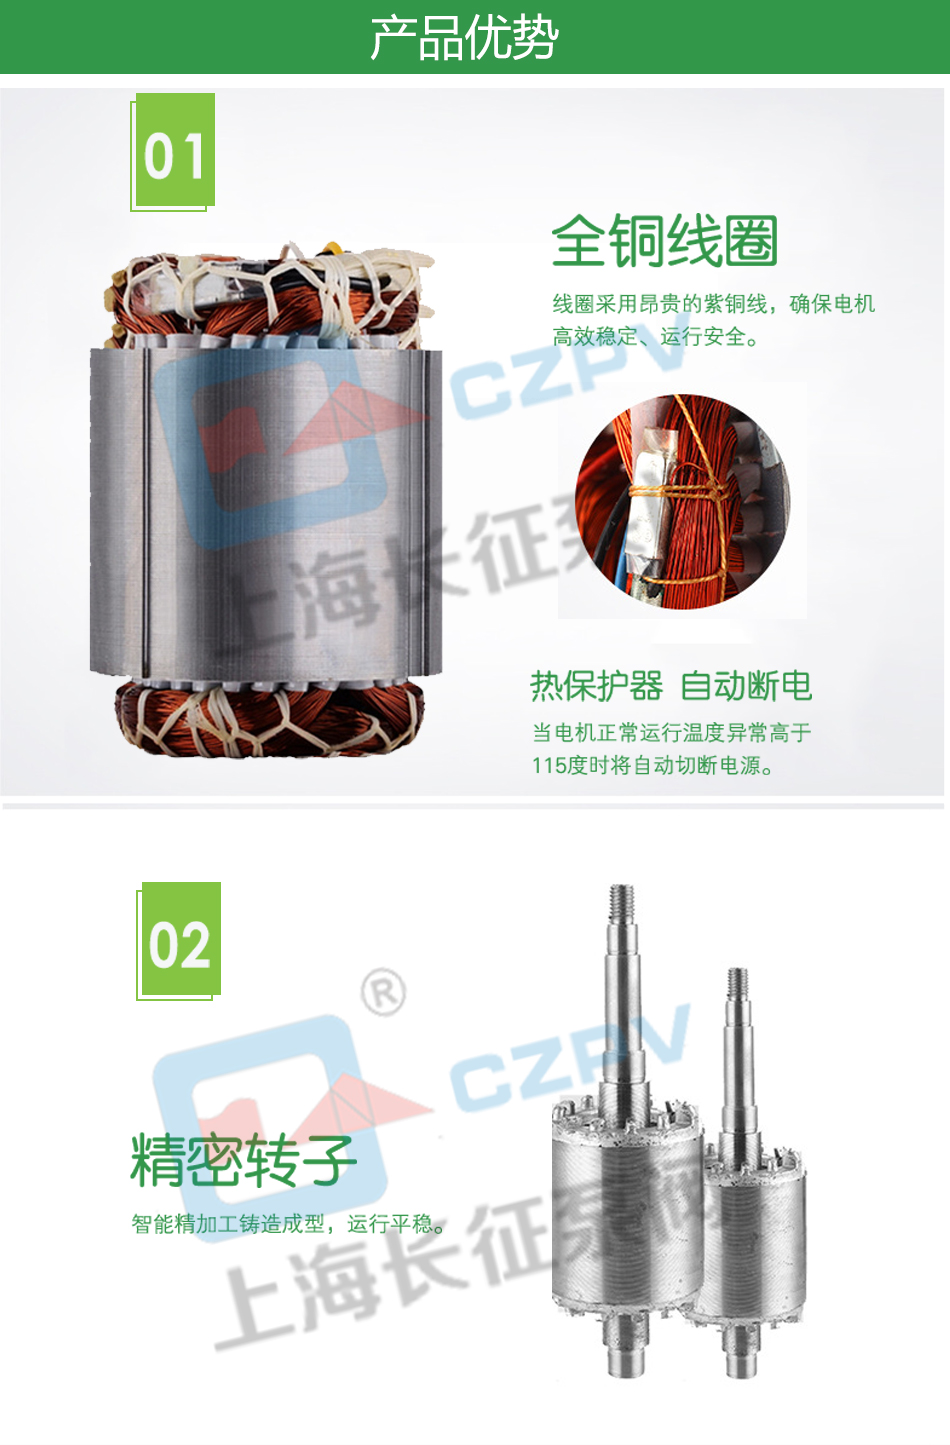 LTP立式高效节能循环水泵产品优势图片